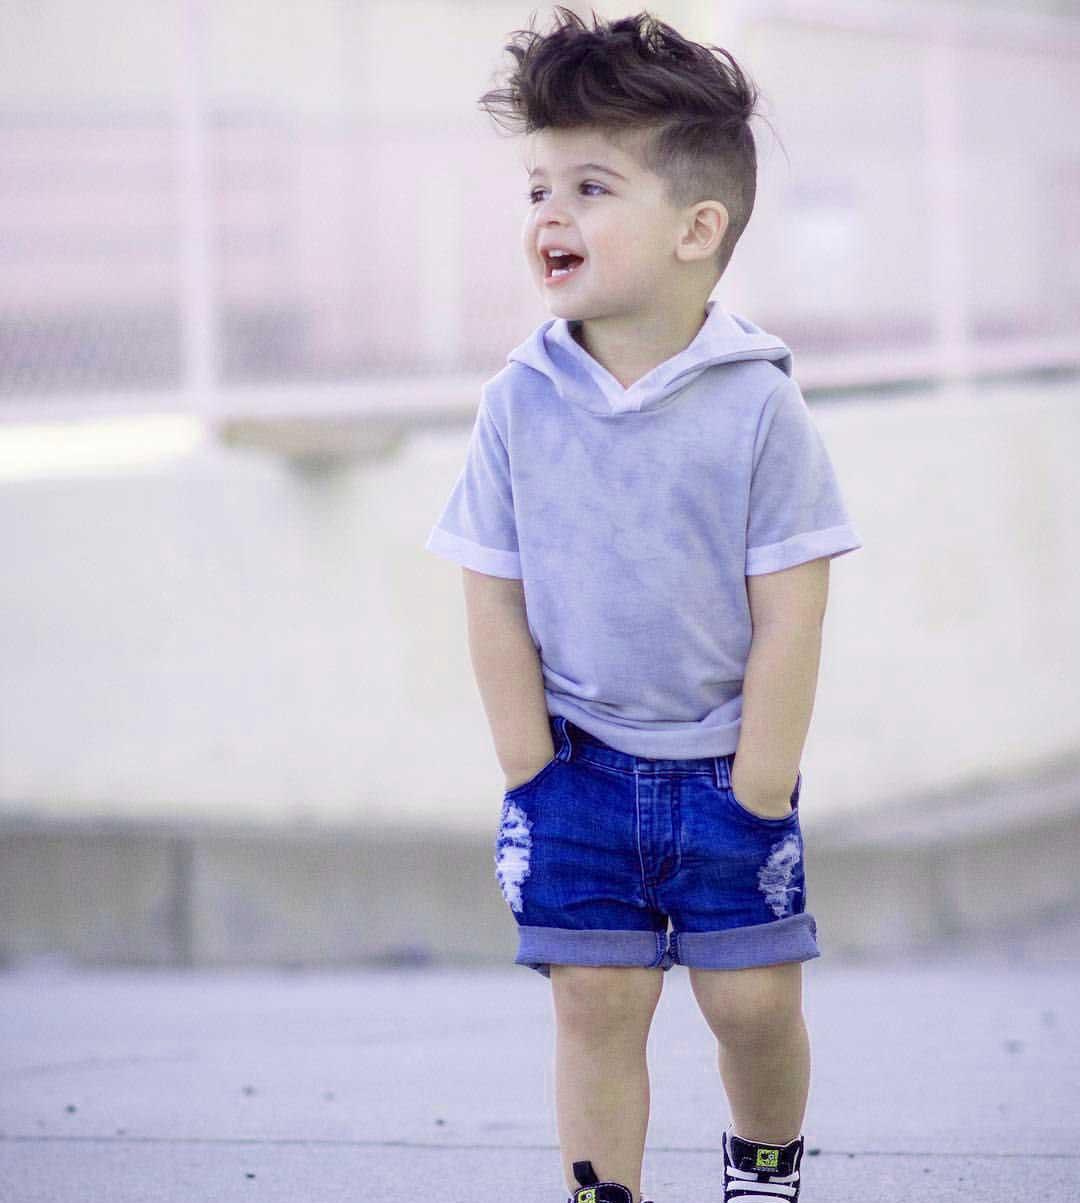 Cute Baby Boys Whatsapp DP Free Hd Pics